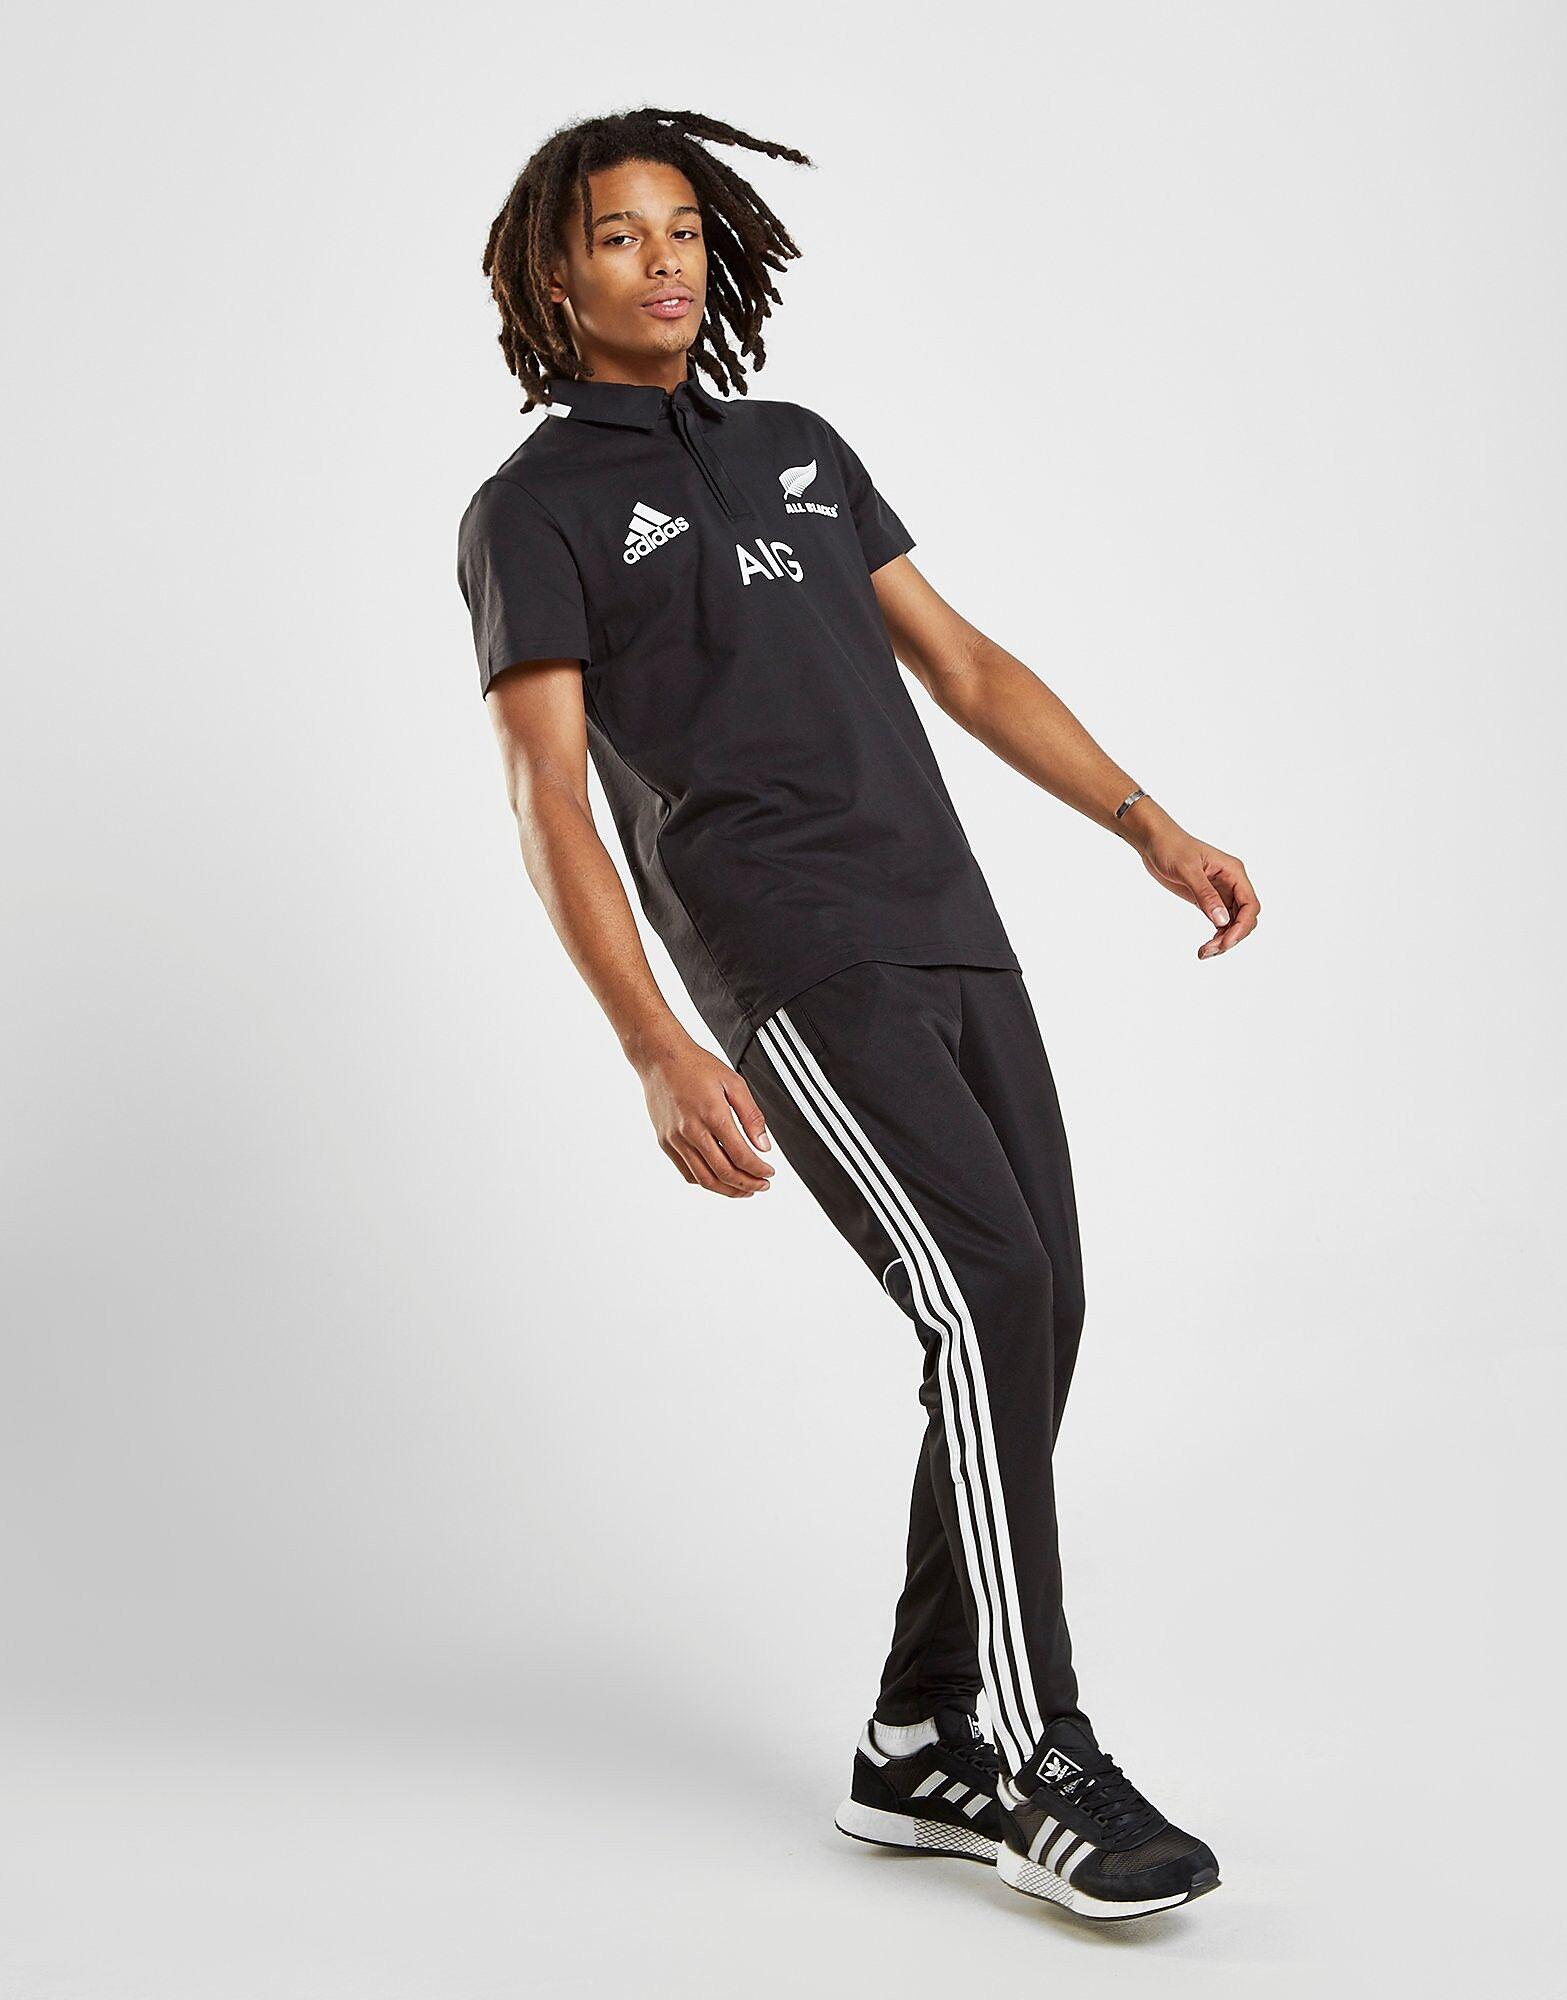 Image of Adidas New Zealand All Blacks Supporters Kotipaita Miehet - Mens, Musta